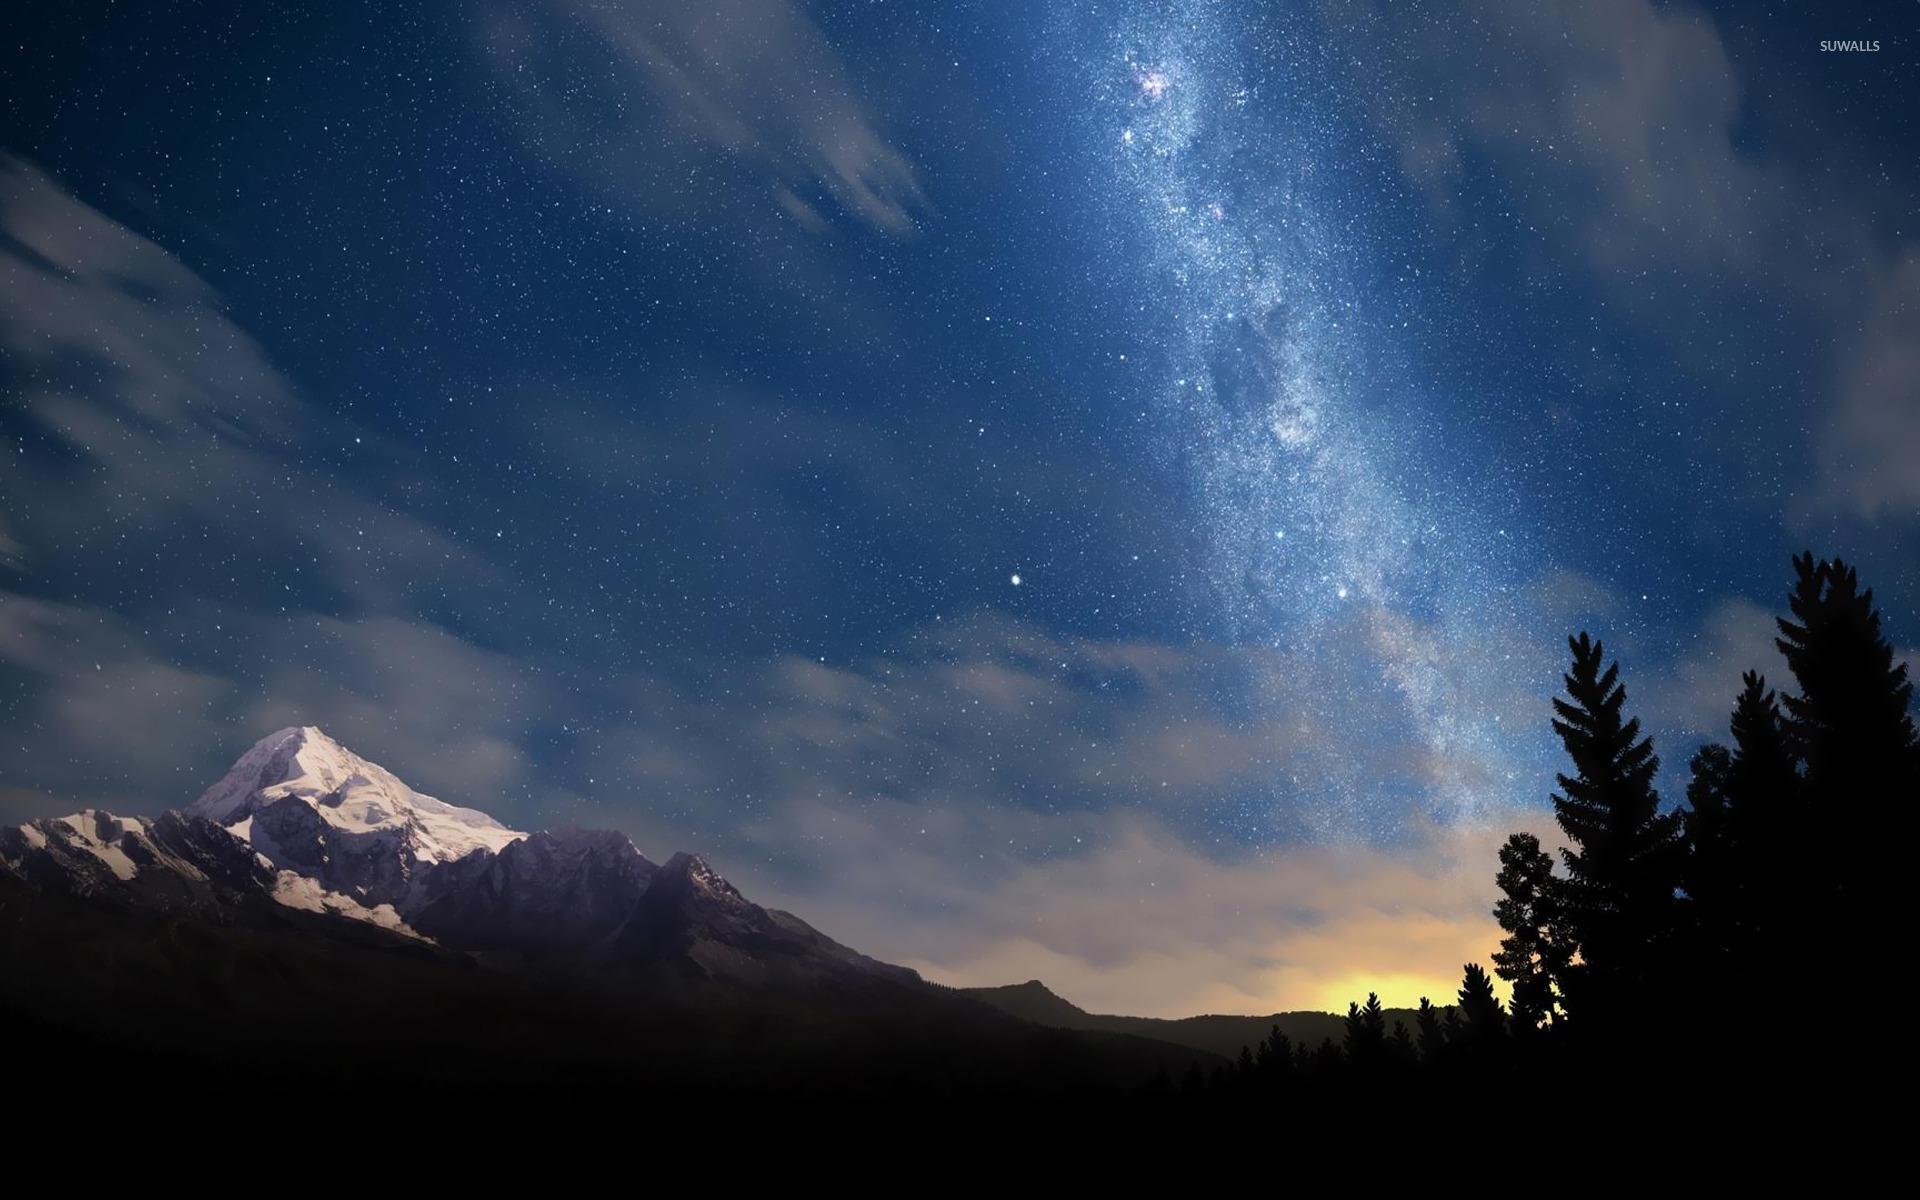 Must see Wallpaper Night Hot Air Balloon - starry-night-sky-14836-1920x1200  Trends-387078.jpg